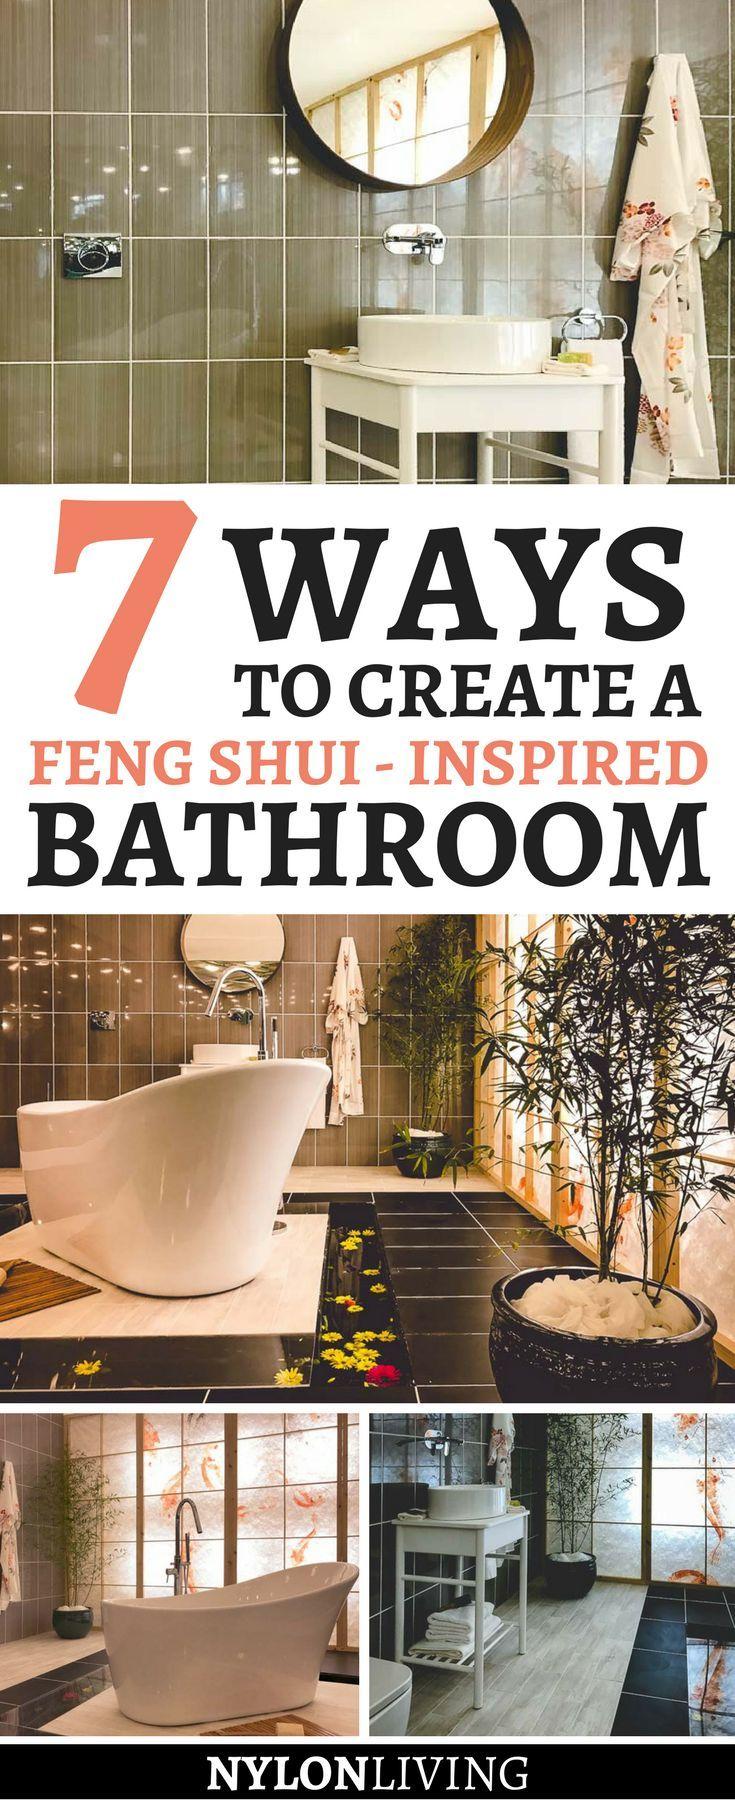 Feng Shui Bathroom Feng Shui Bathroom Feng Shui Bathroom Colors Feng Shui Bathroom Decor Feng shui bathroom decor